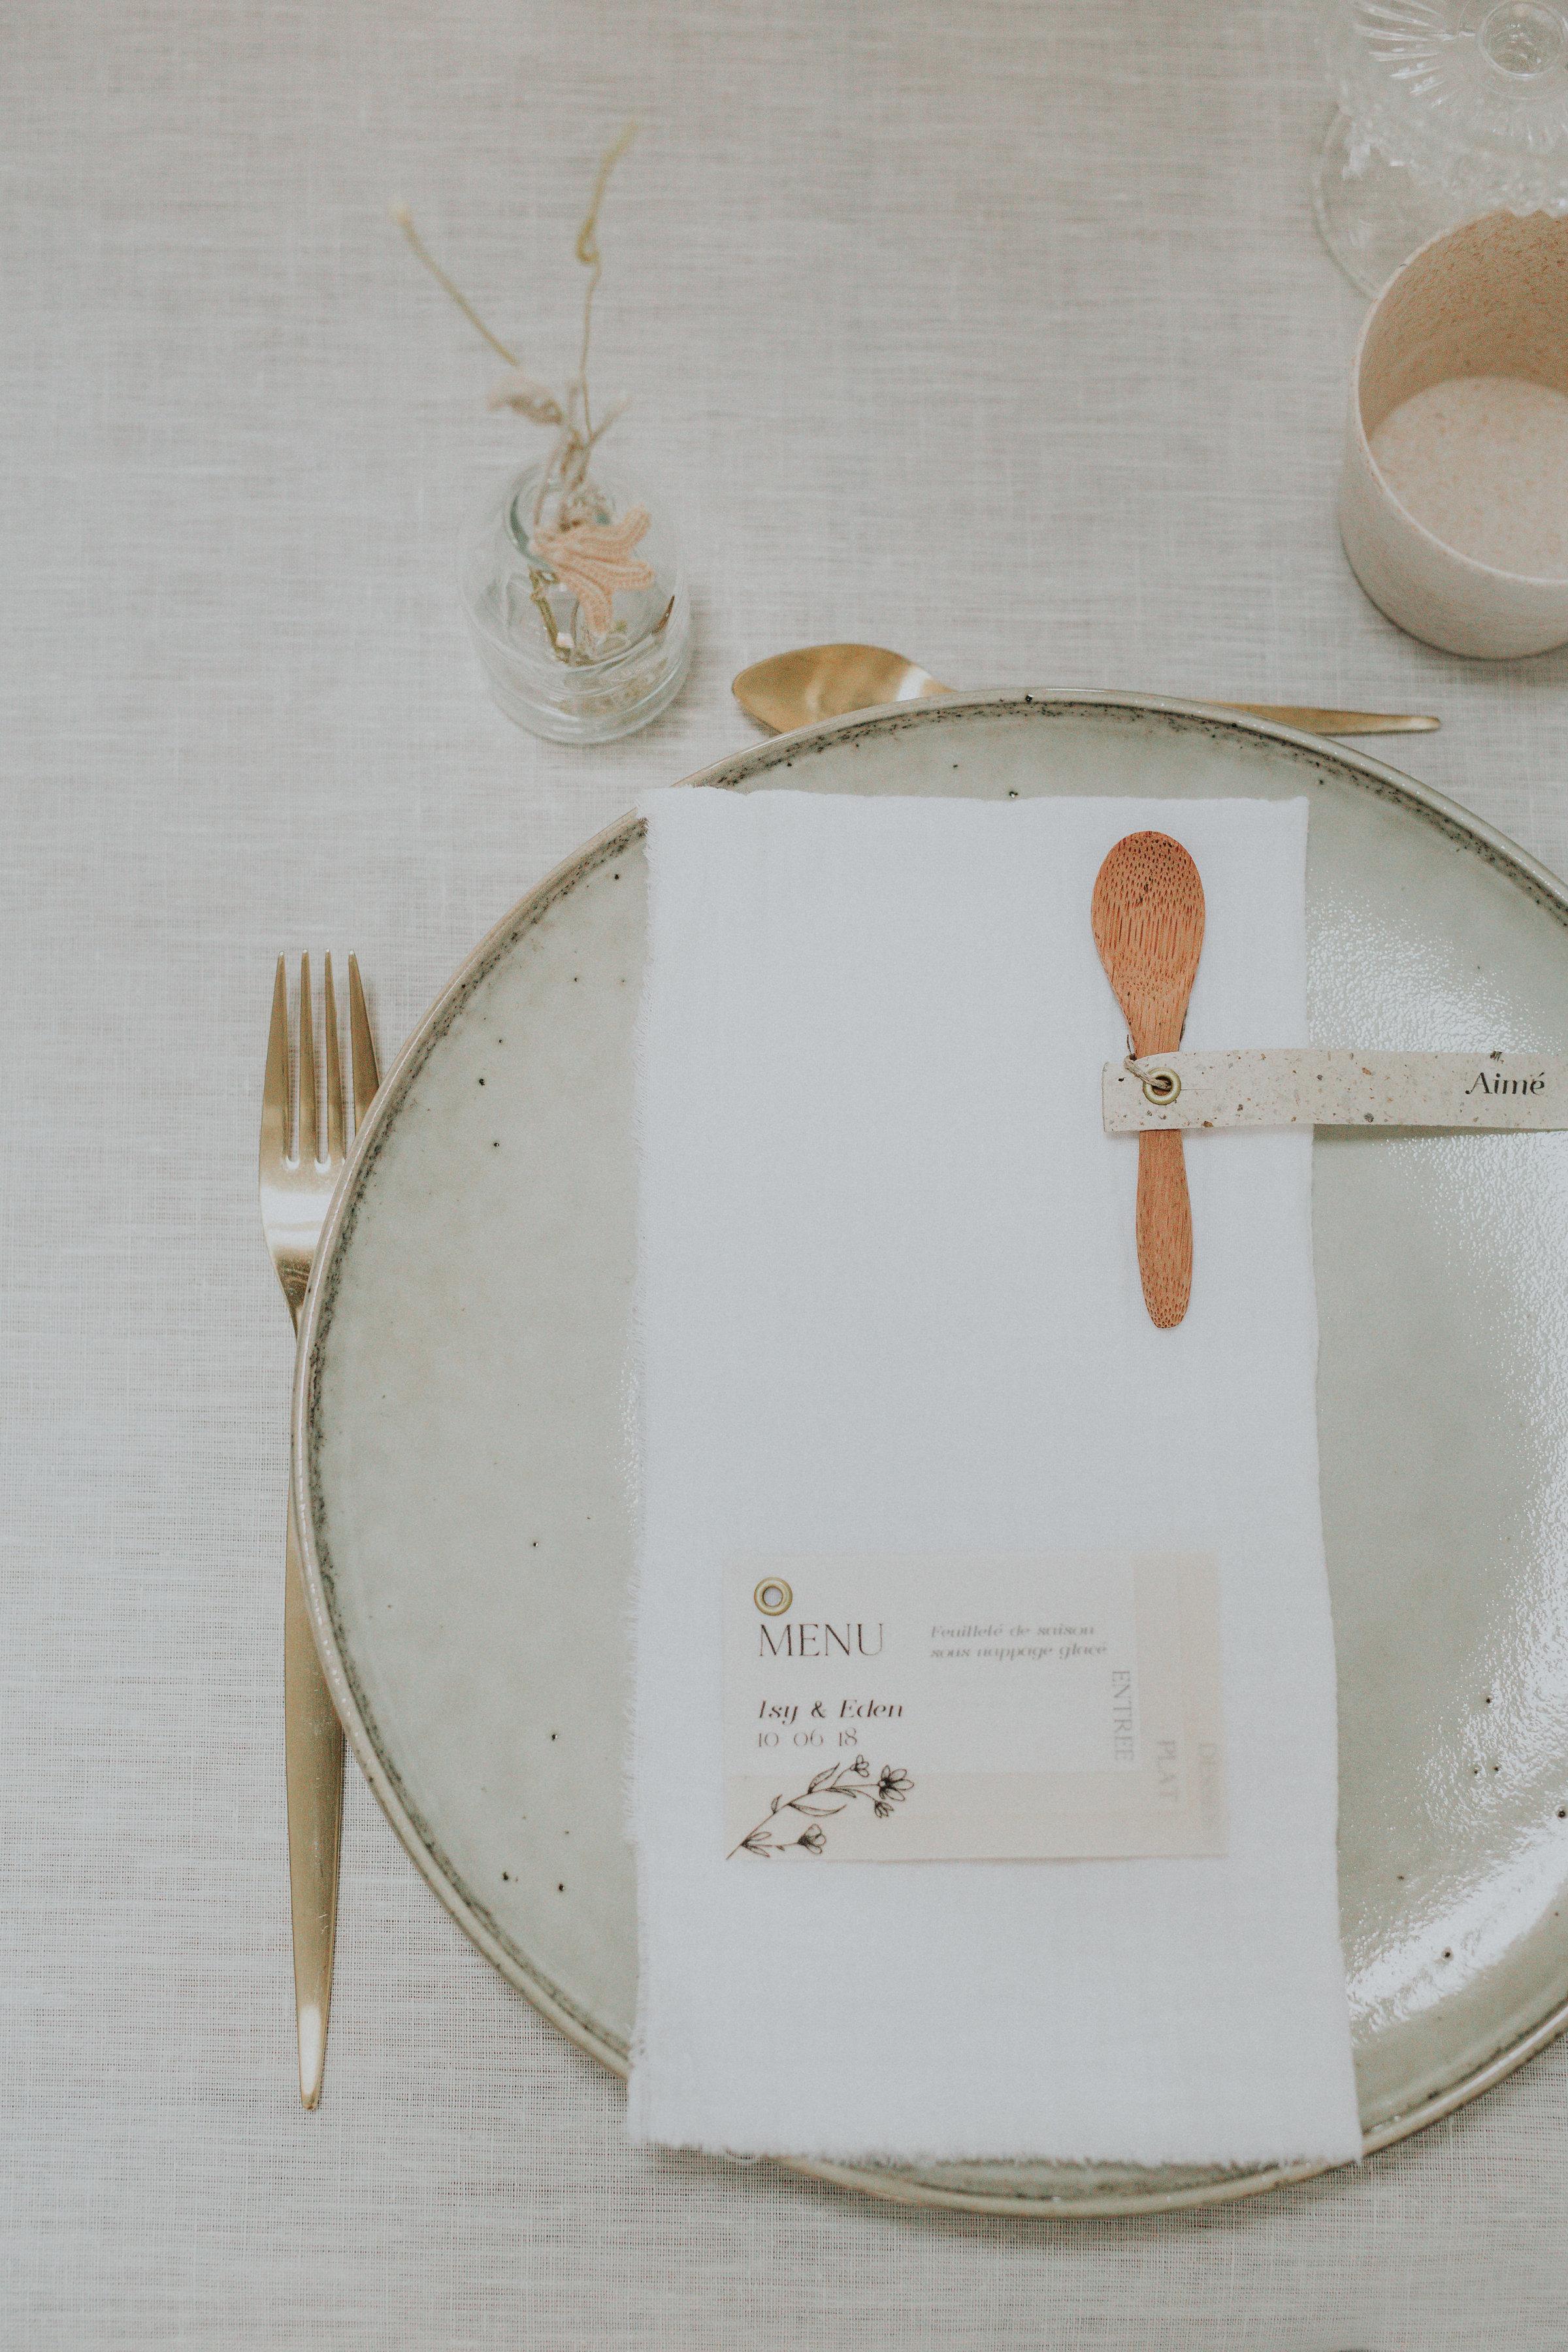 vaisselle mariage Eco-responsable